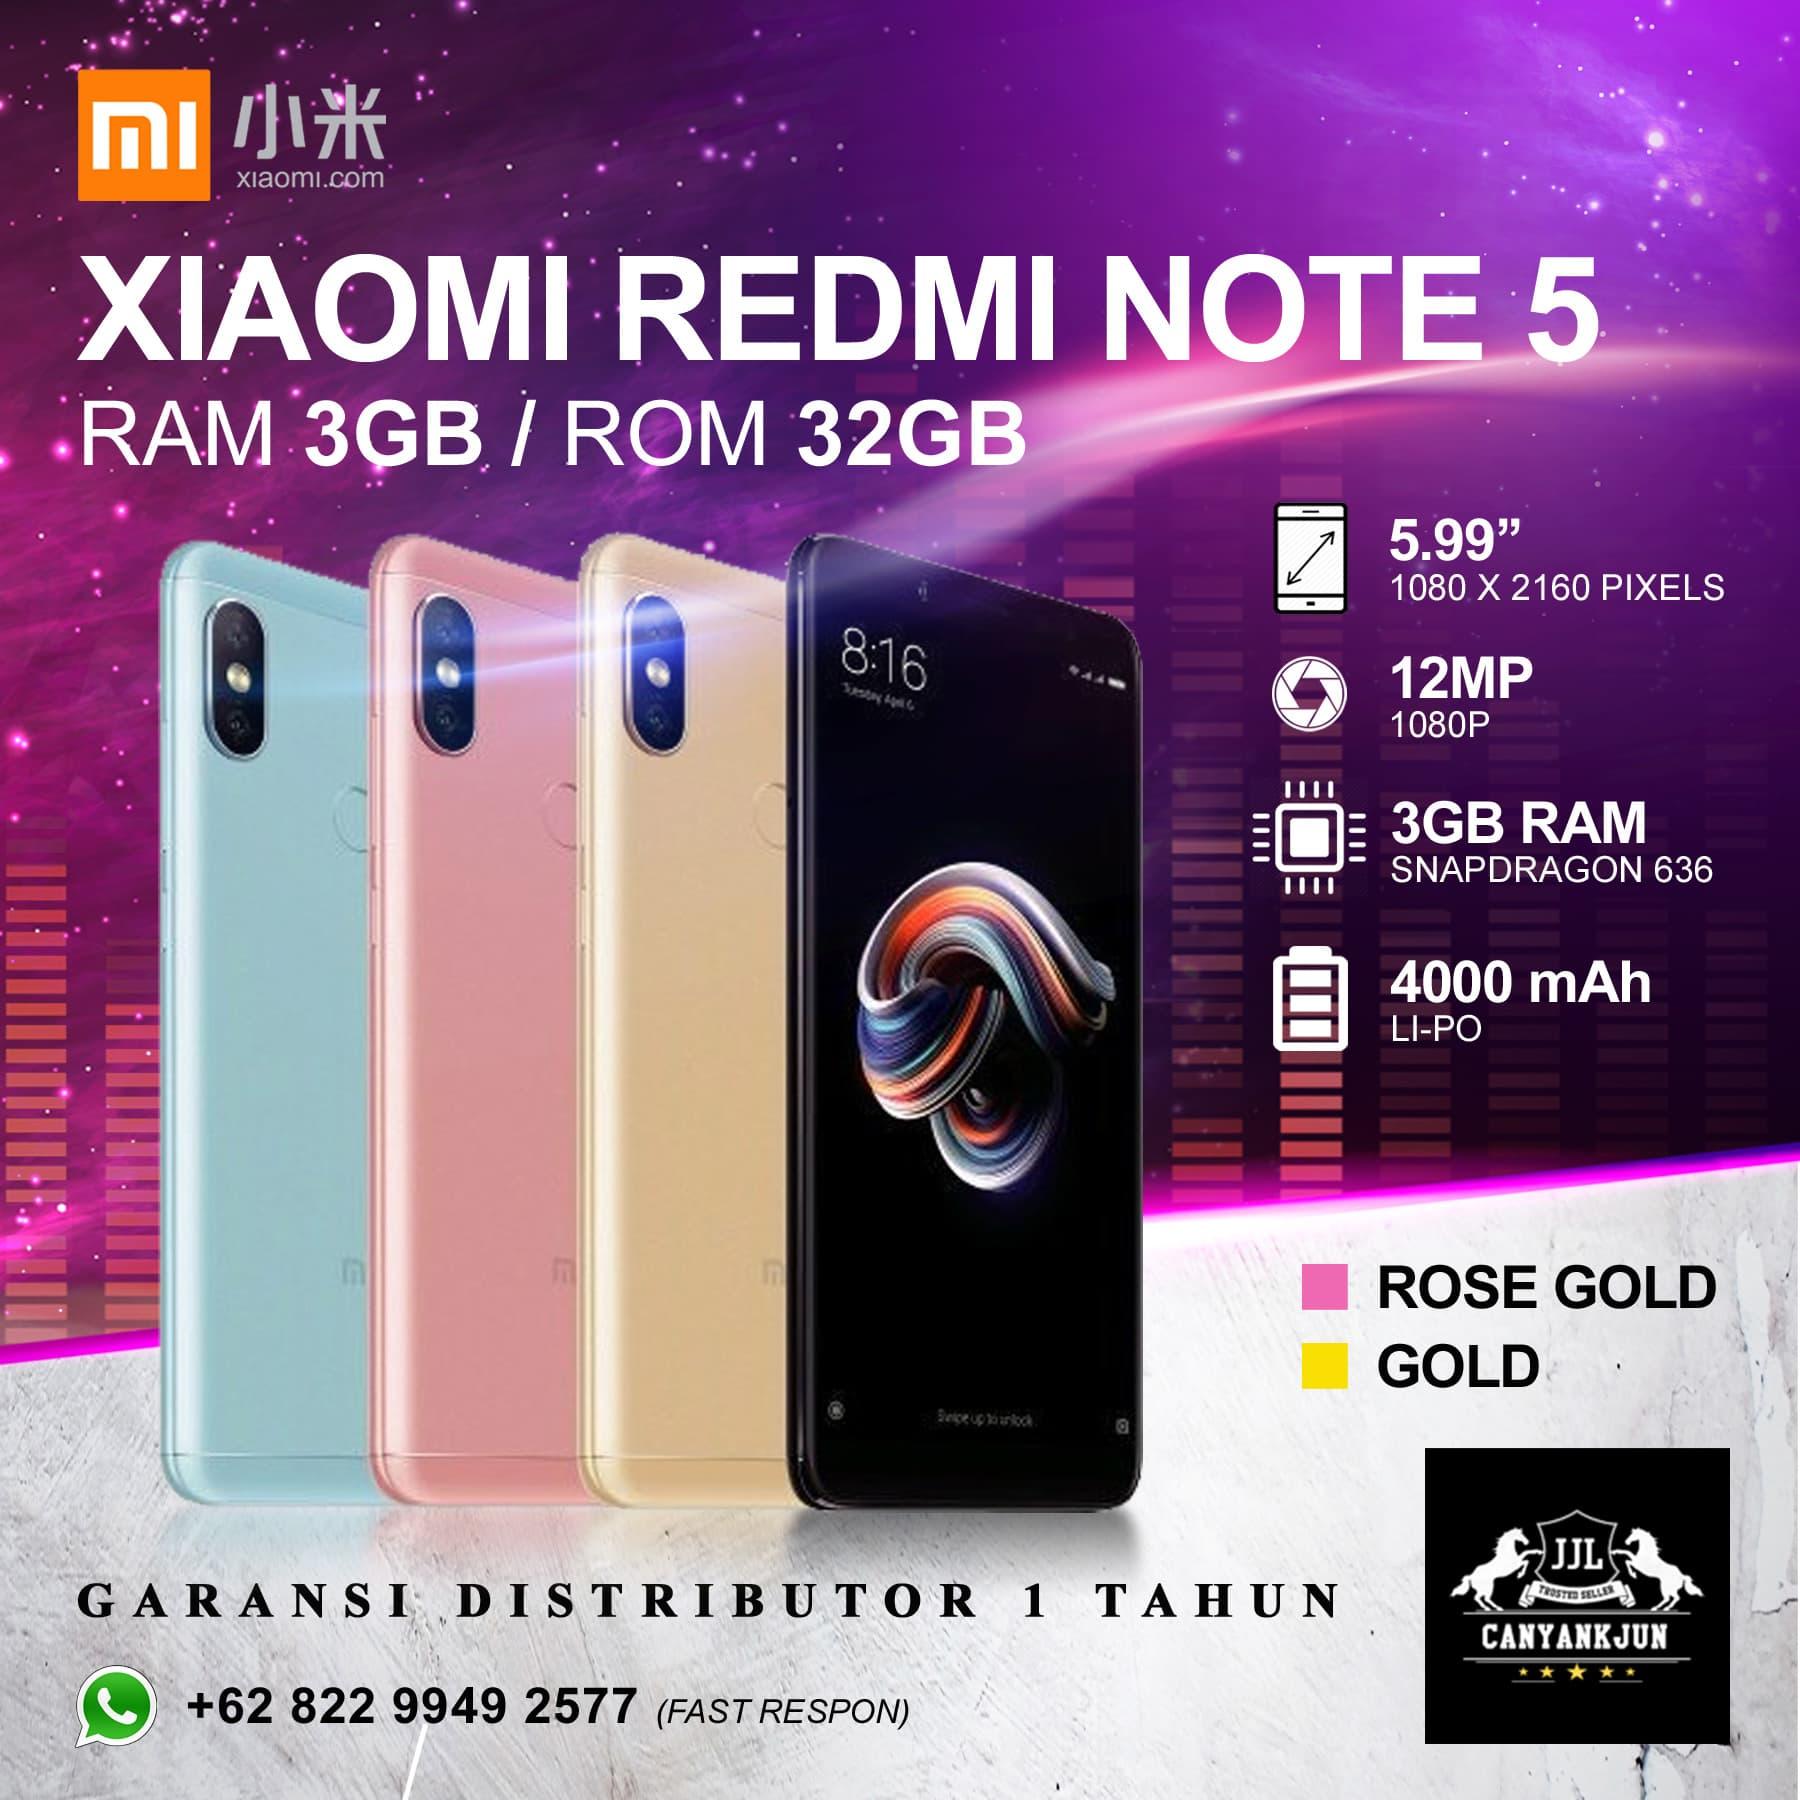 Jual Xiaomi Redmi Note 5 Ram 3gb Rom 32gb Garansi Distributor 1 S2 Gold 3 Gb 32 Tahun Brand New In Box Emas Canyankjun Tokopedia